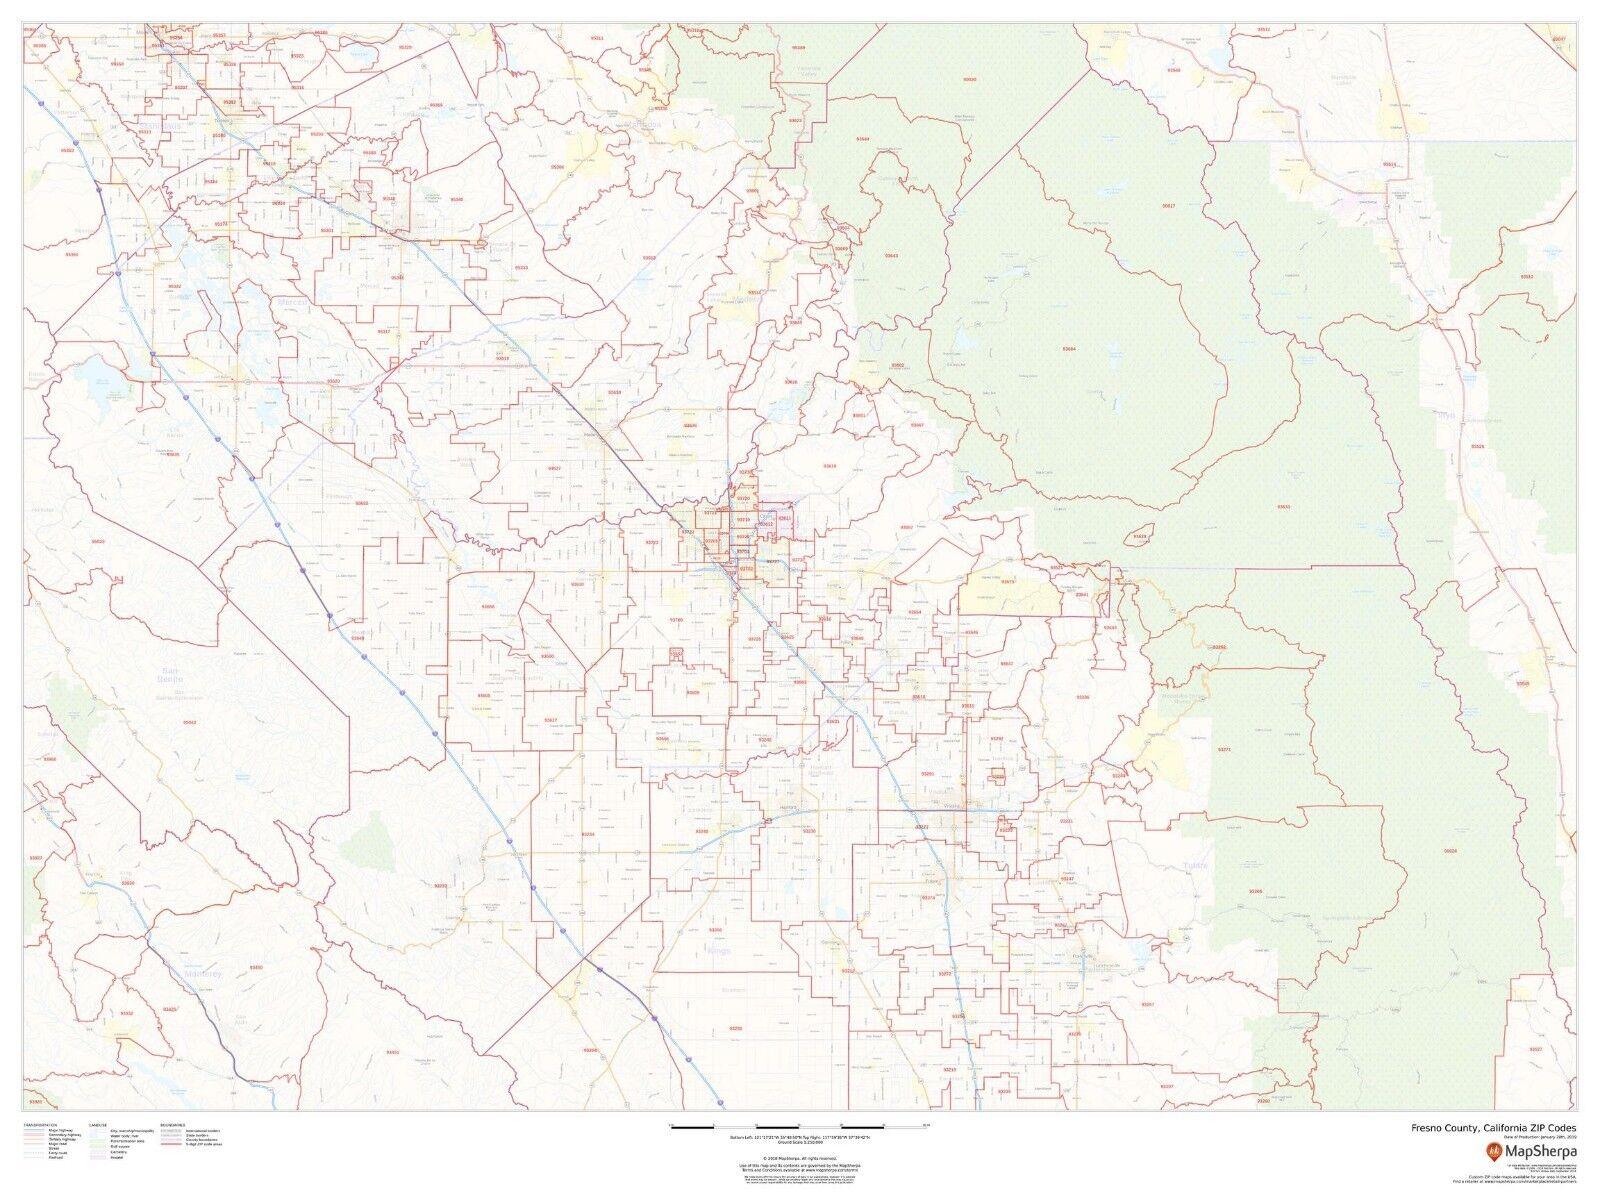 Fresno County, California ZIP Codes Laminated Wall Map (MSH)   eBay